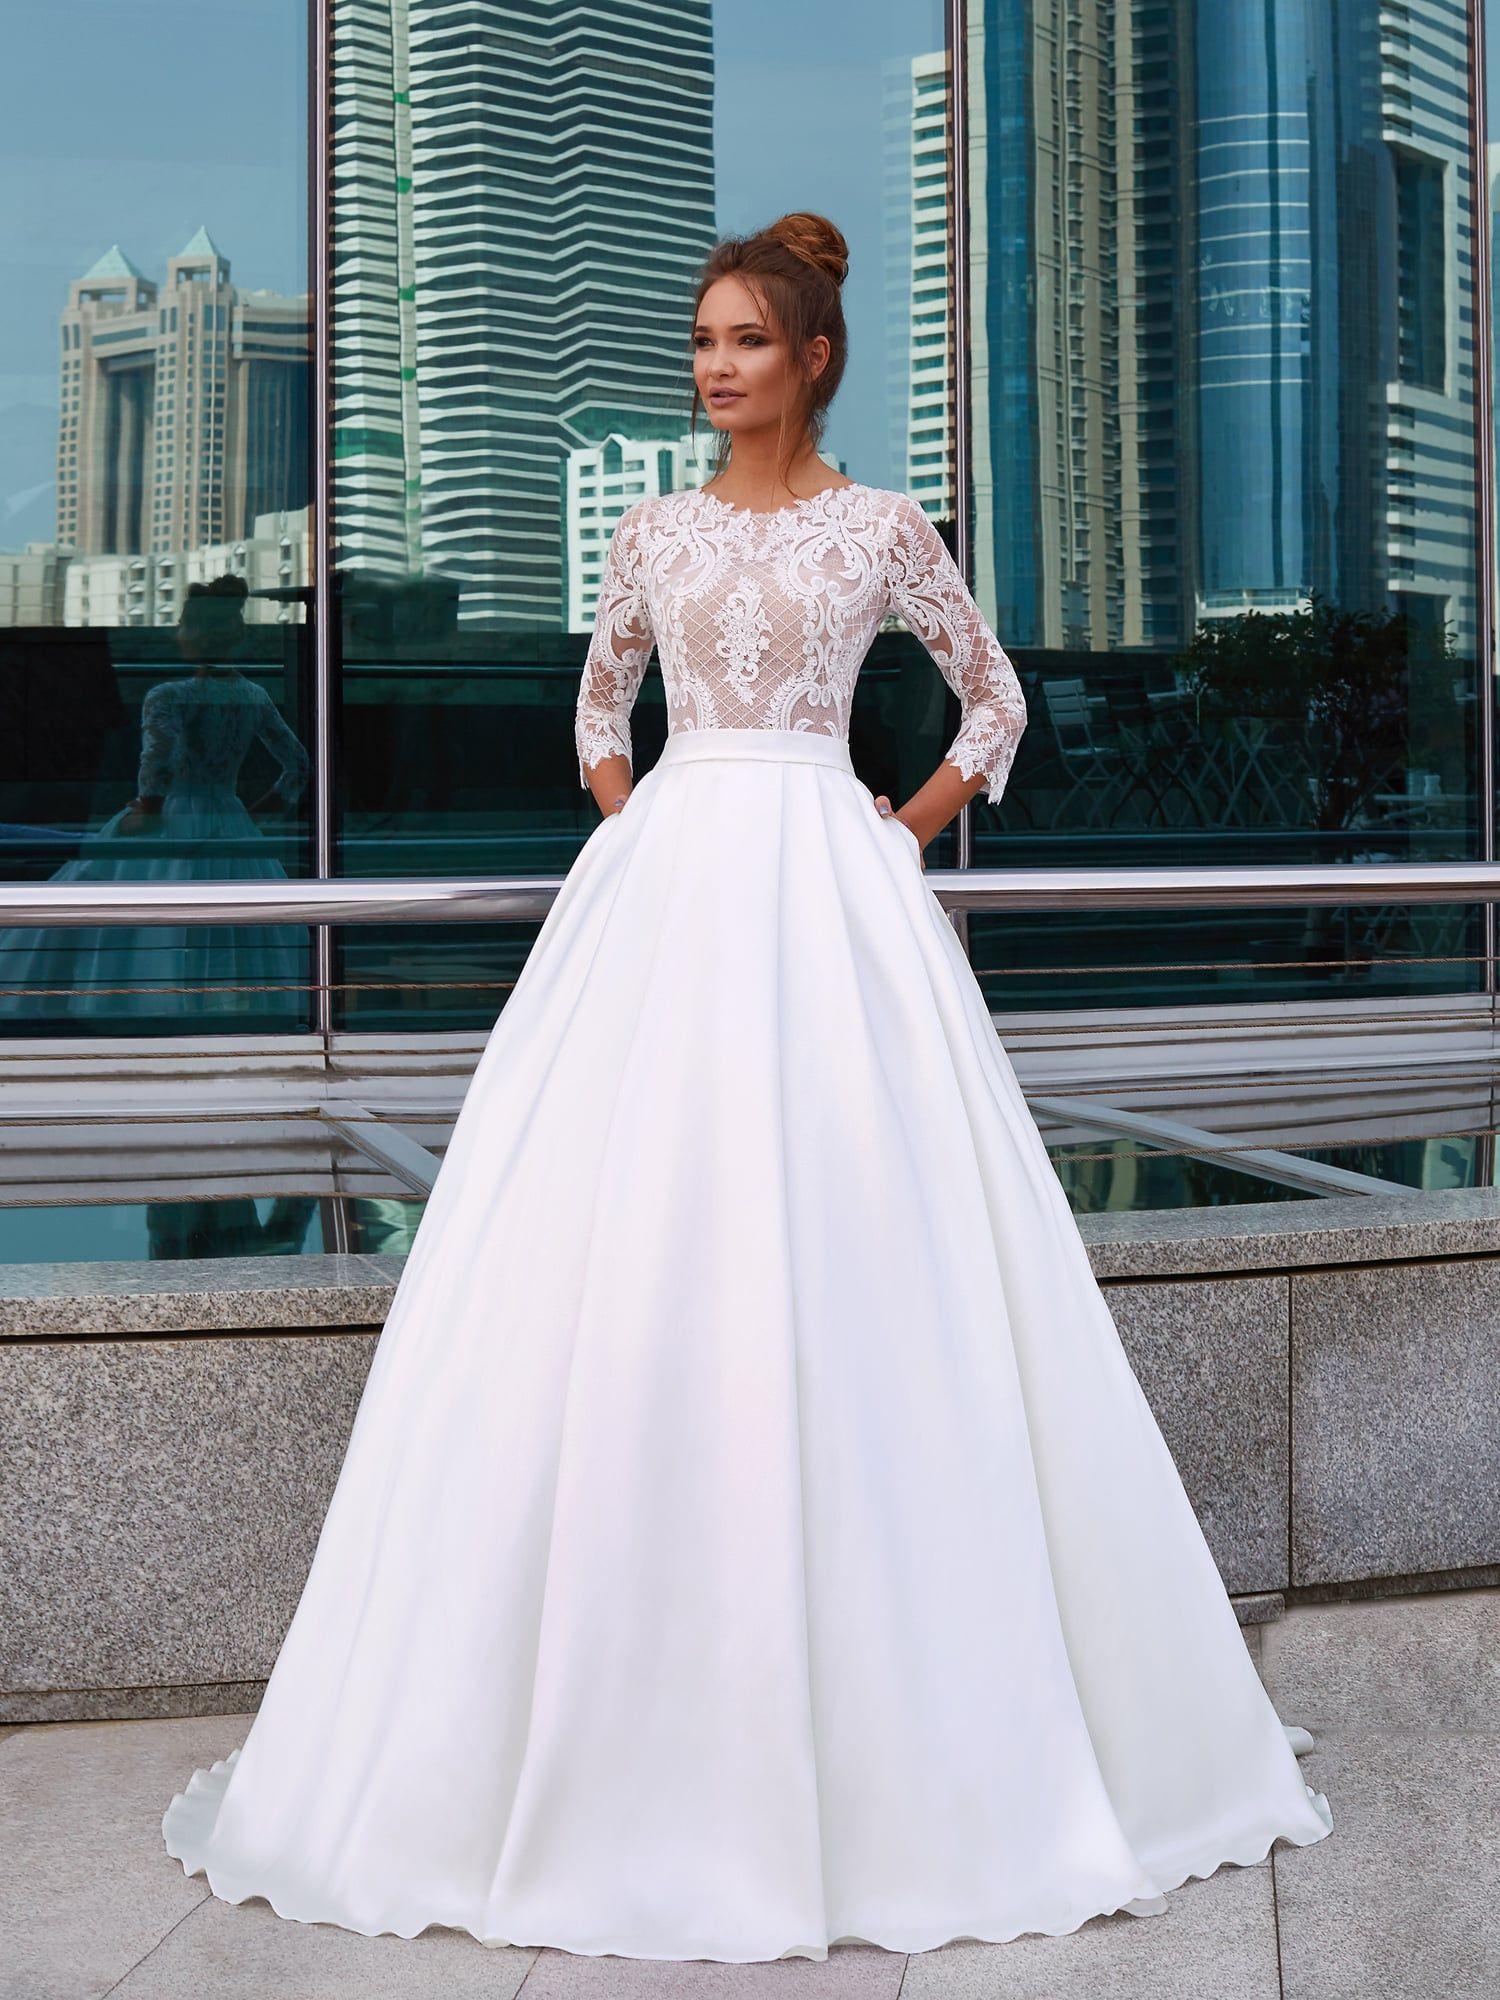 7796958addf7 PASSETTO wedding dress by LANESTA